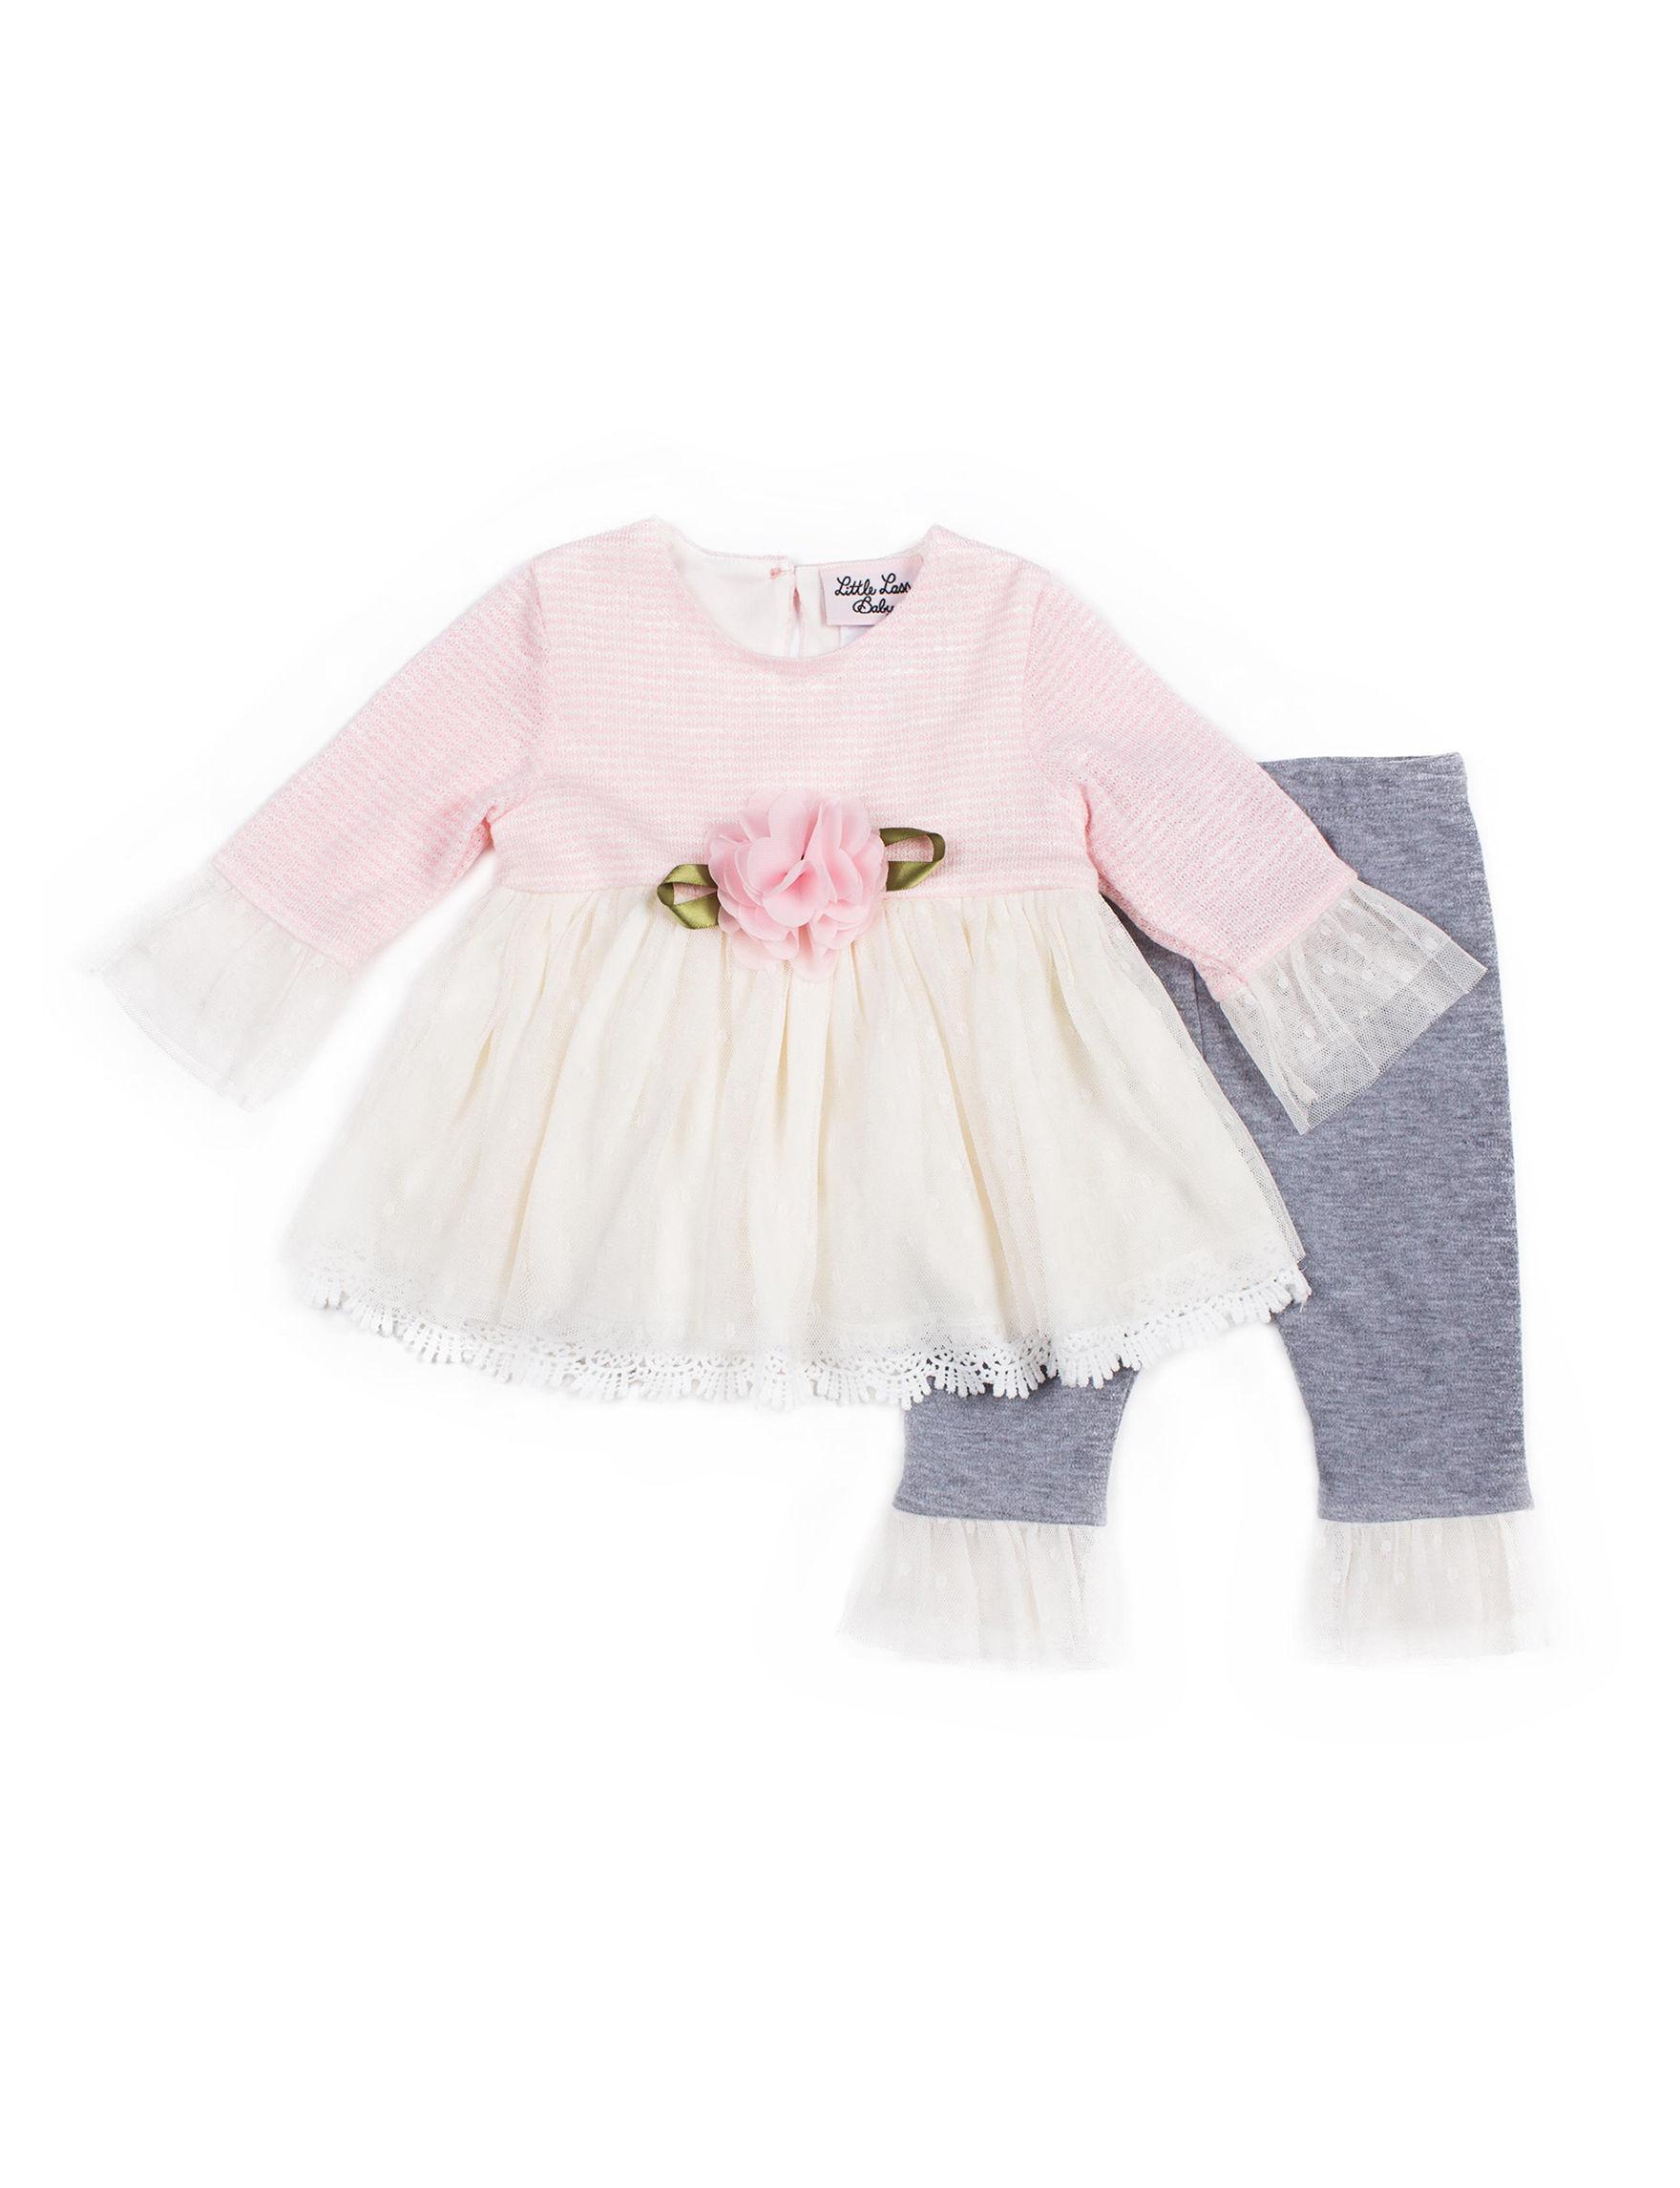 Little Lass Pink / White / Grey